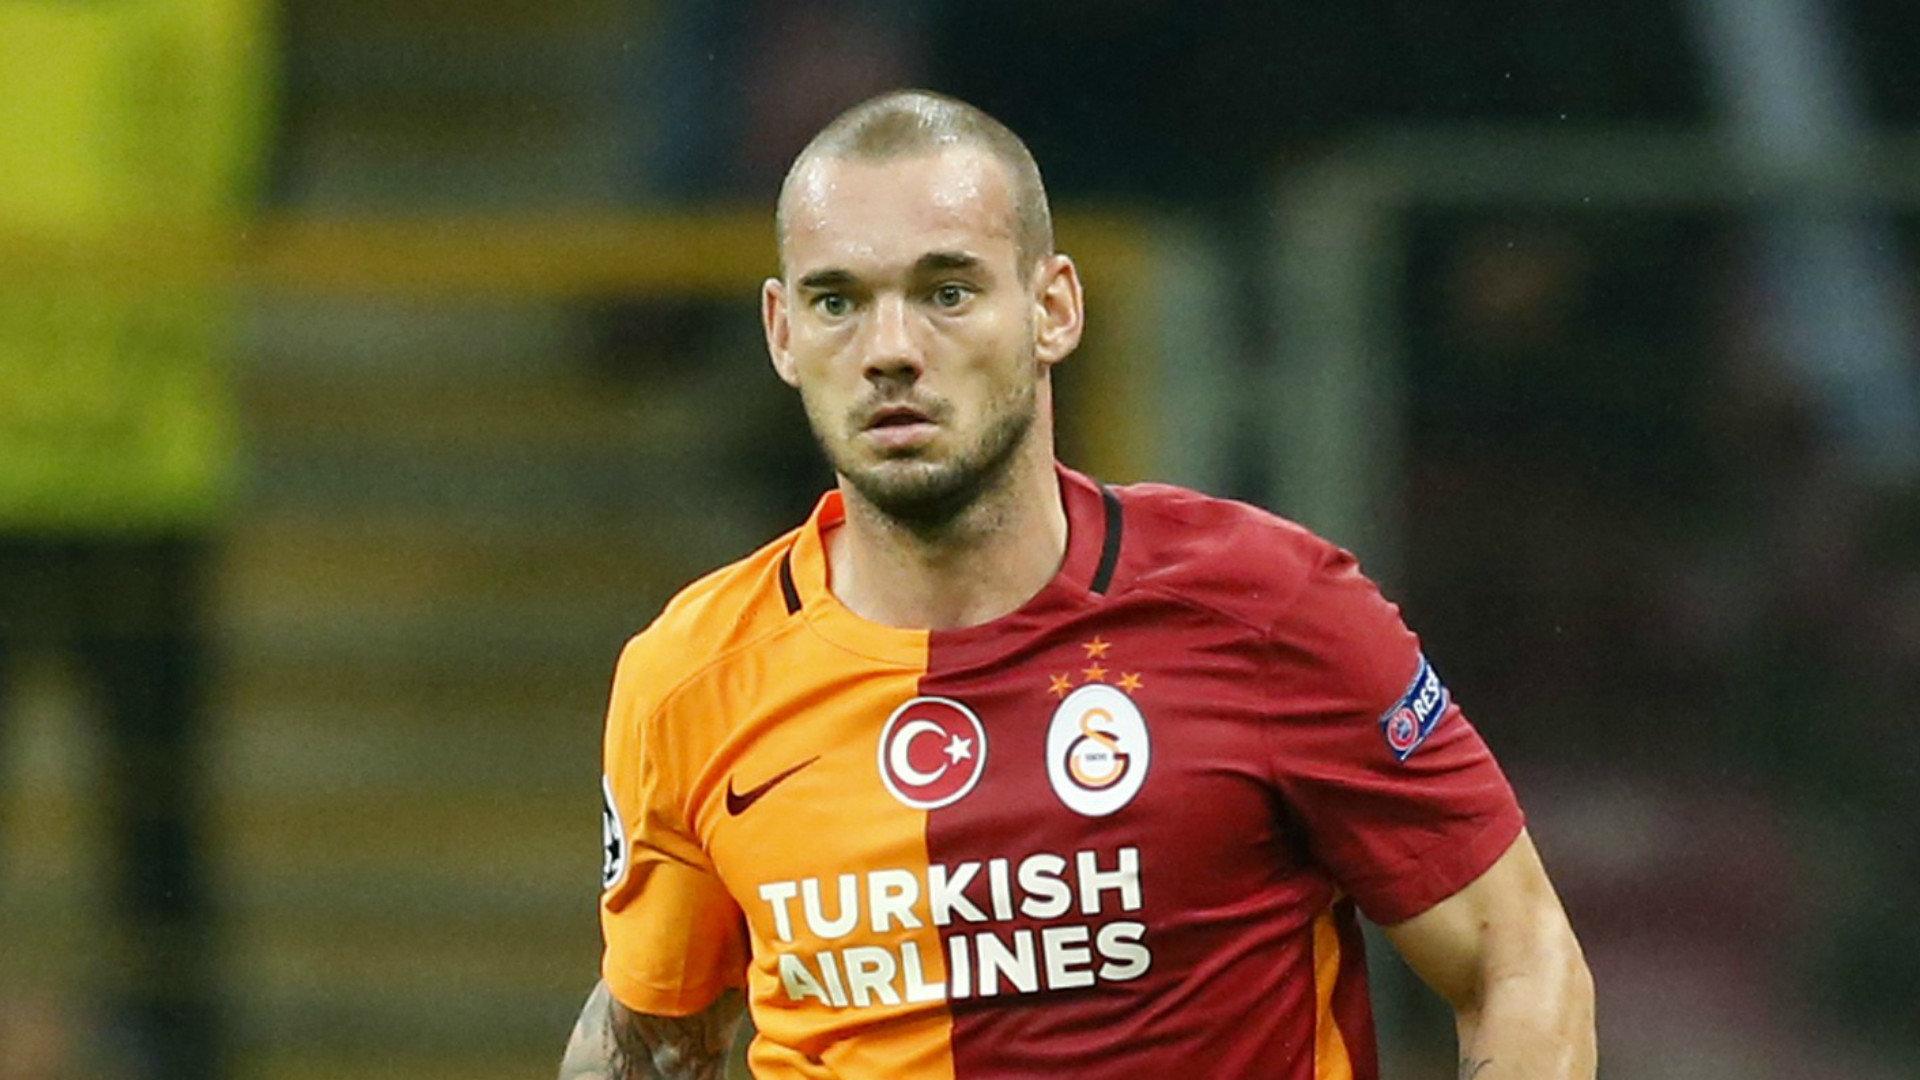 wesley-sneijder-cin-transfer